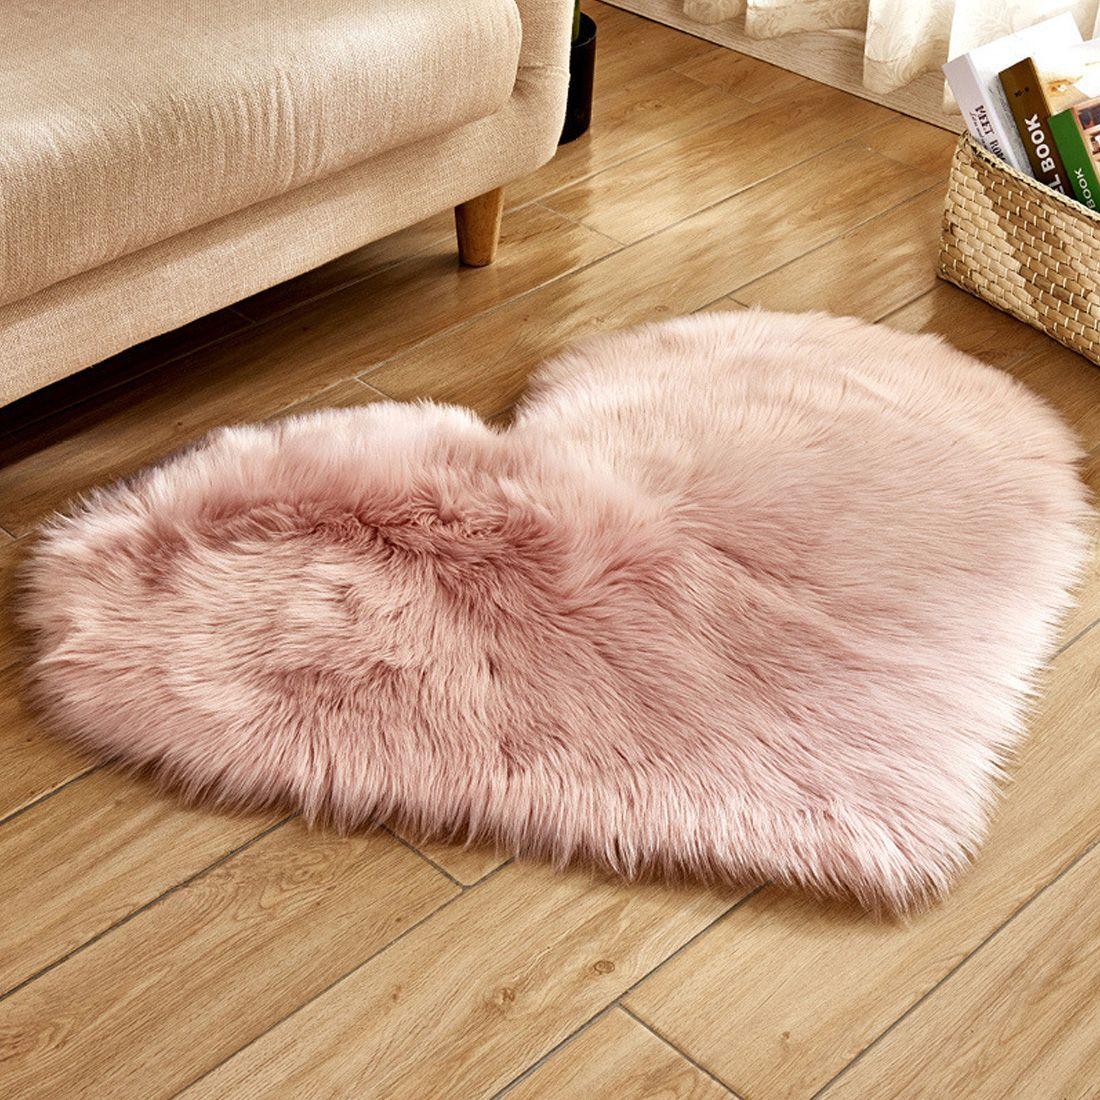 Love Heart Rugs Artificial fur Sheepskin Hairy Carpet Bedroom Living Room Decor Soft Shaggy Area Rug